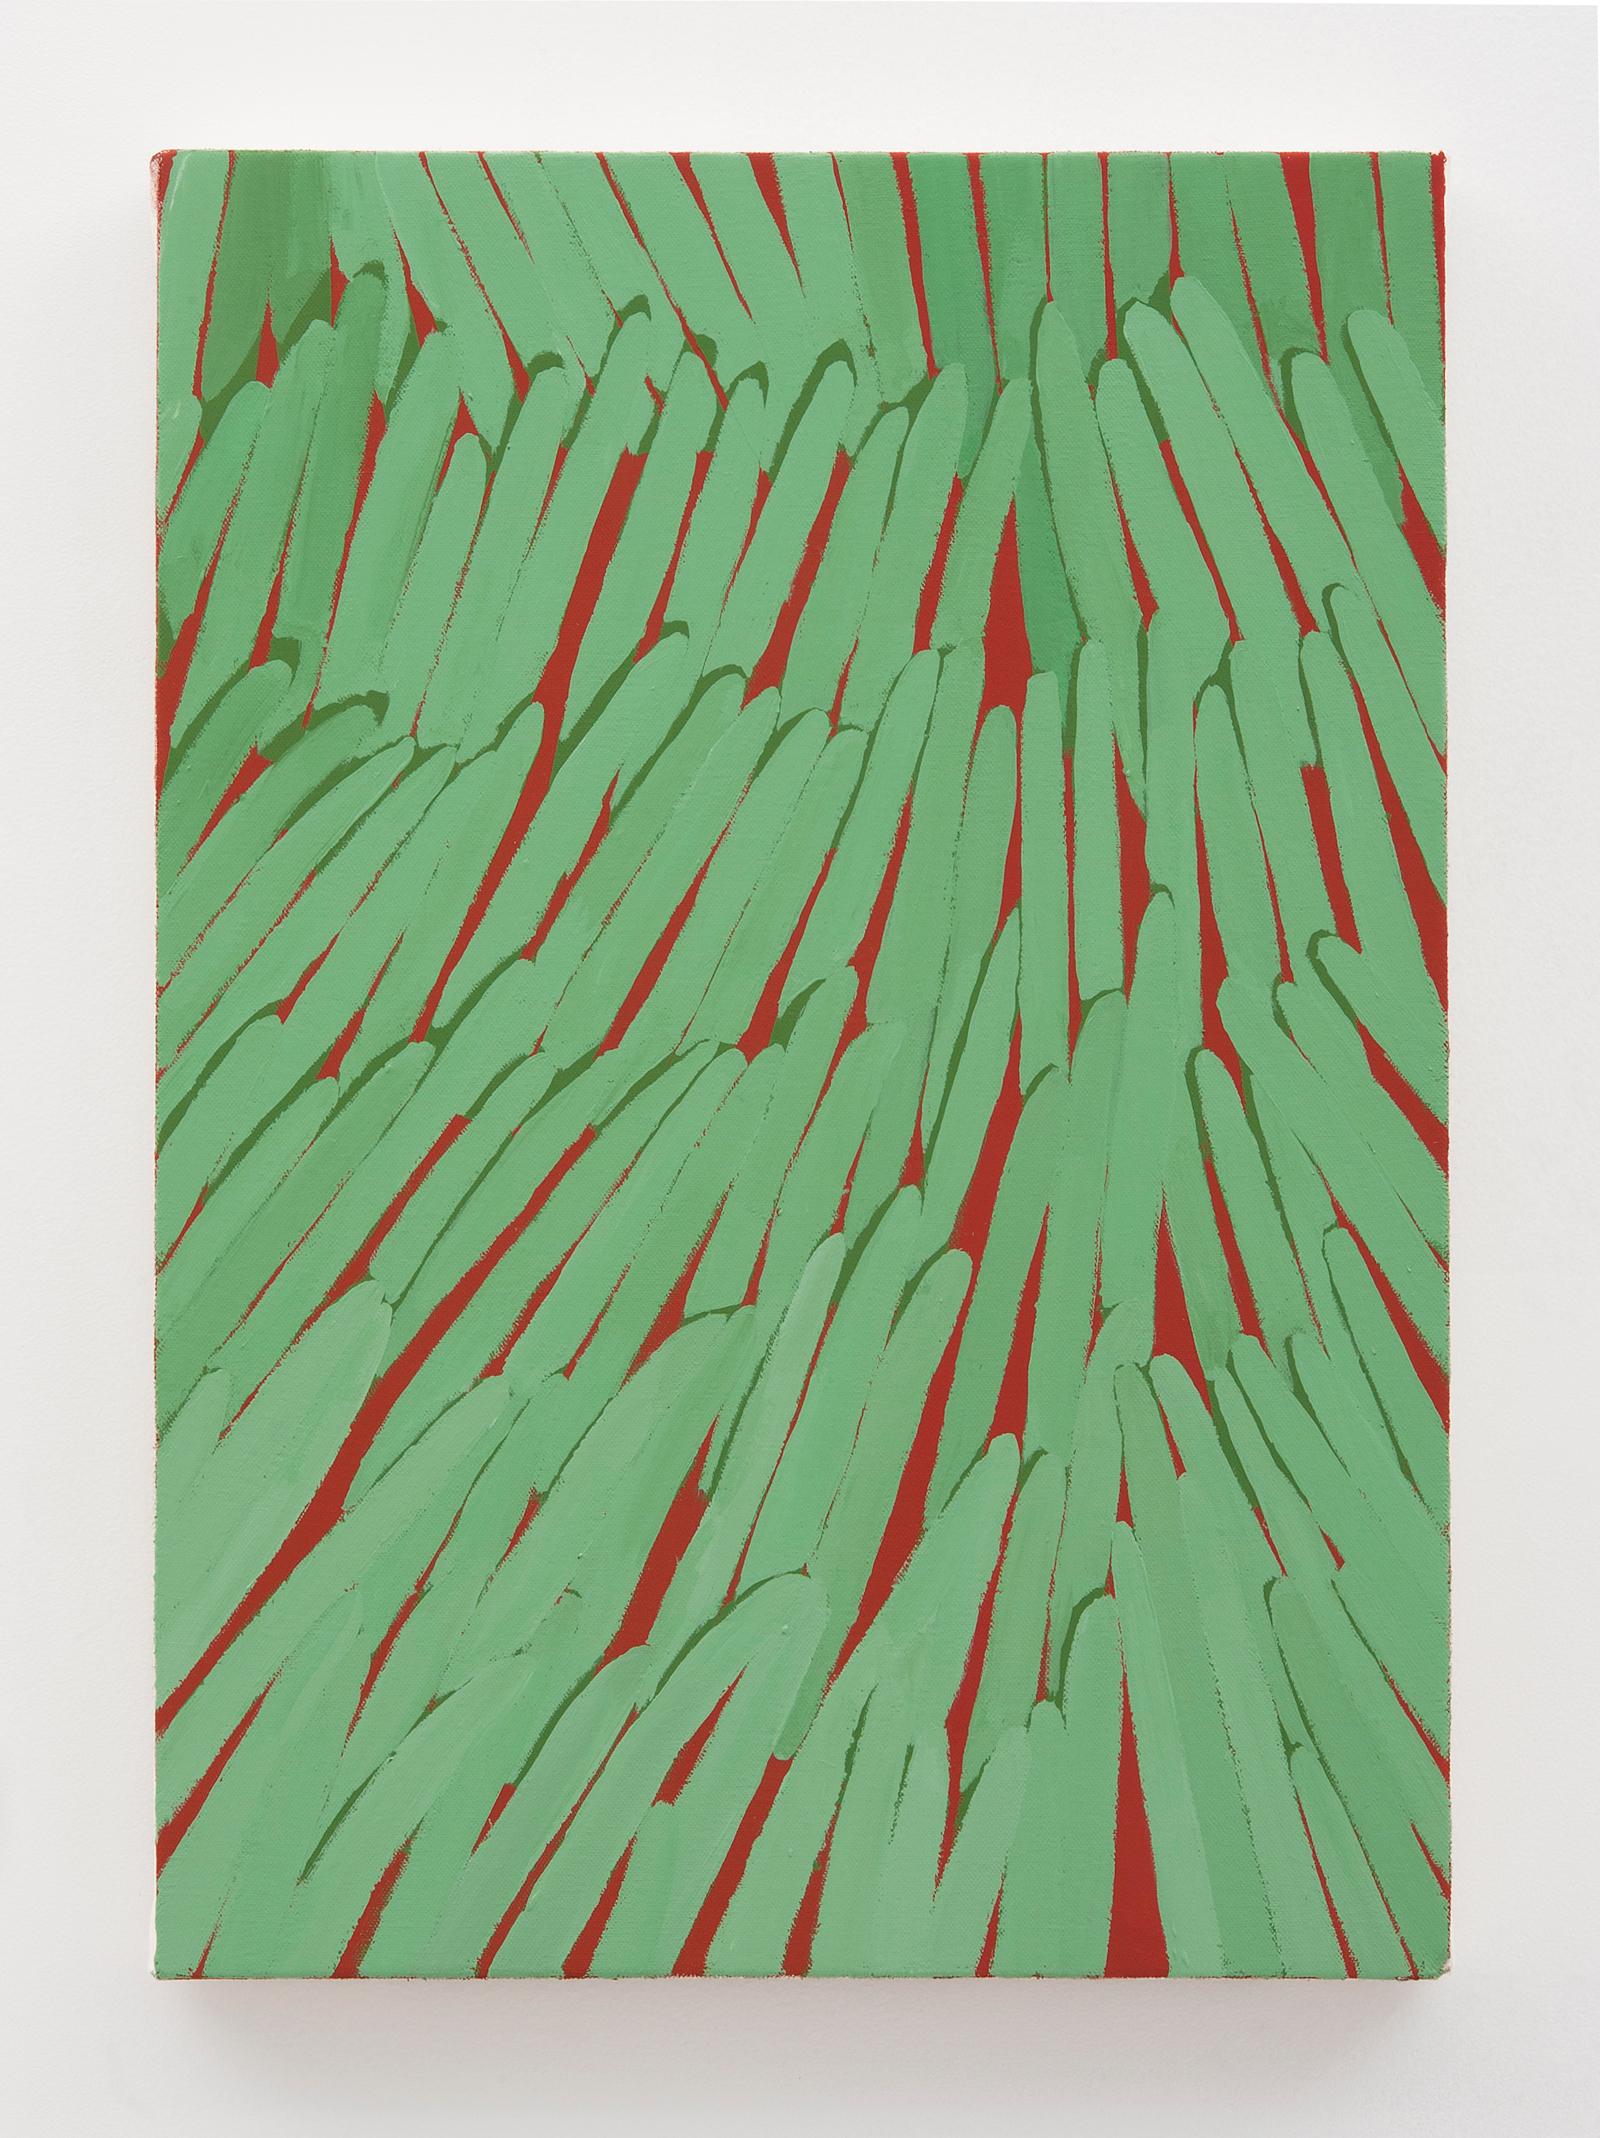 Corydon Cowansage, Grass #42, 2015, 20 x 14 inches, acrylic on canvas